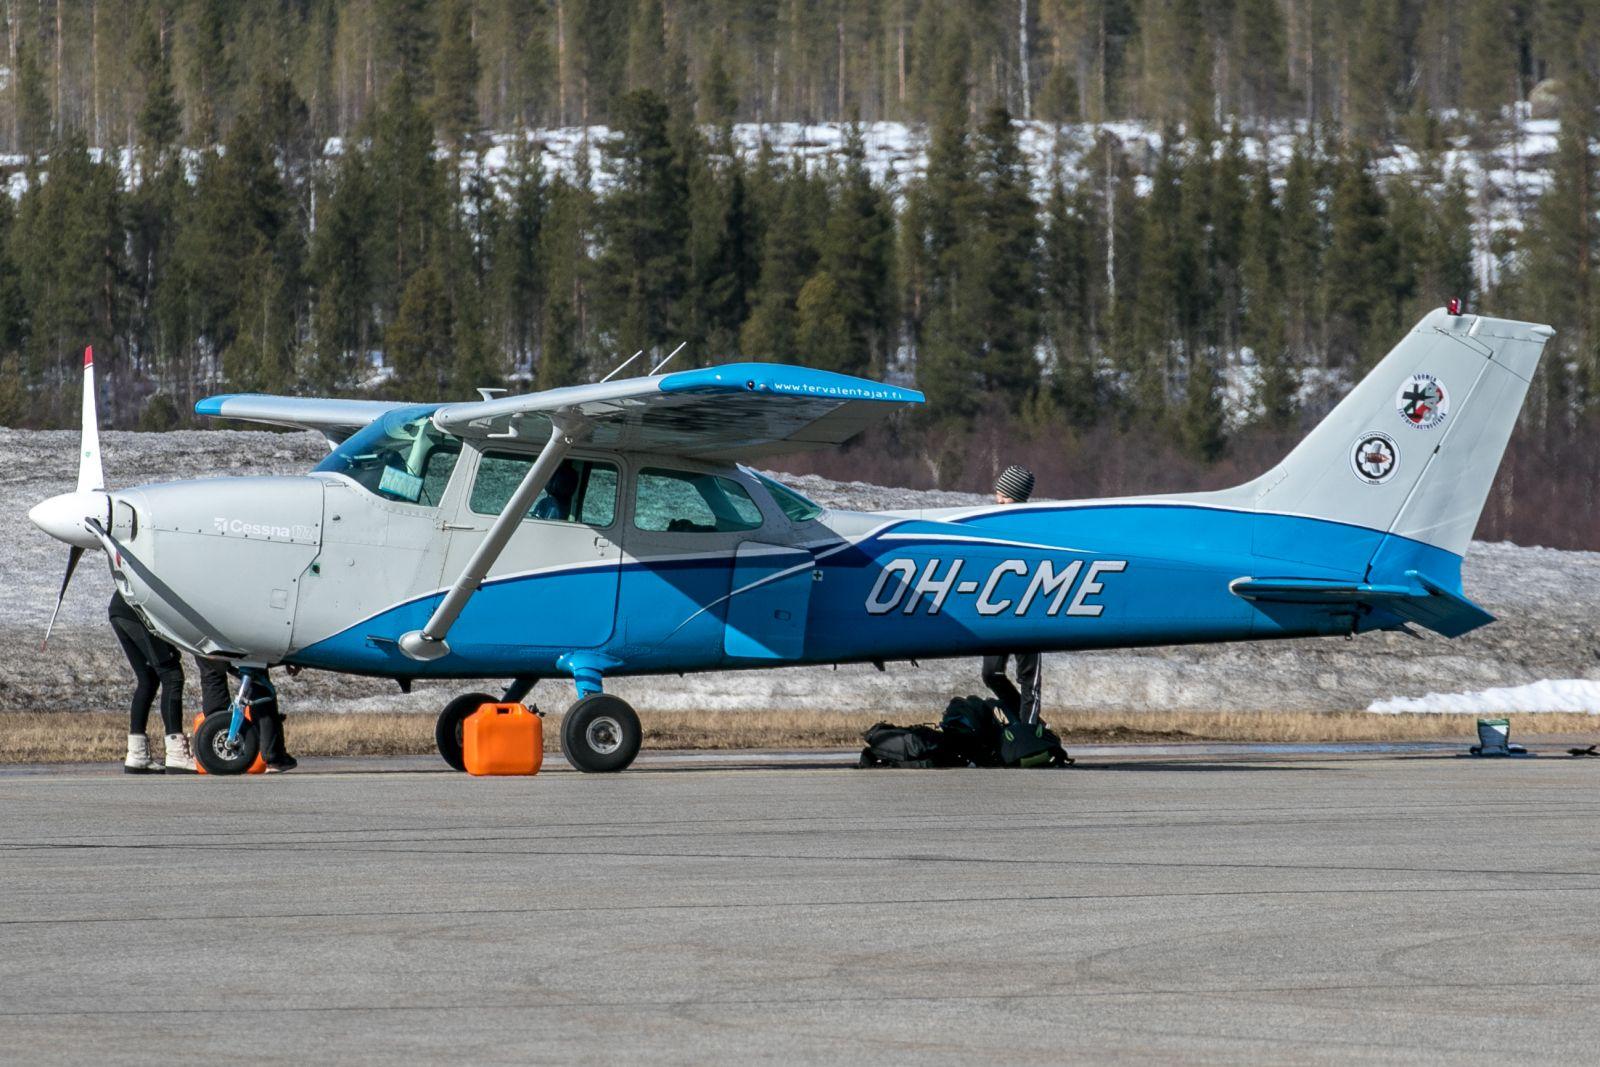 OH-CME. Tervalentäjien Cessna 172 Skyhawk II. 18.4.2021